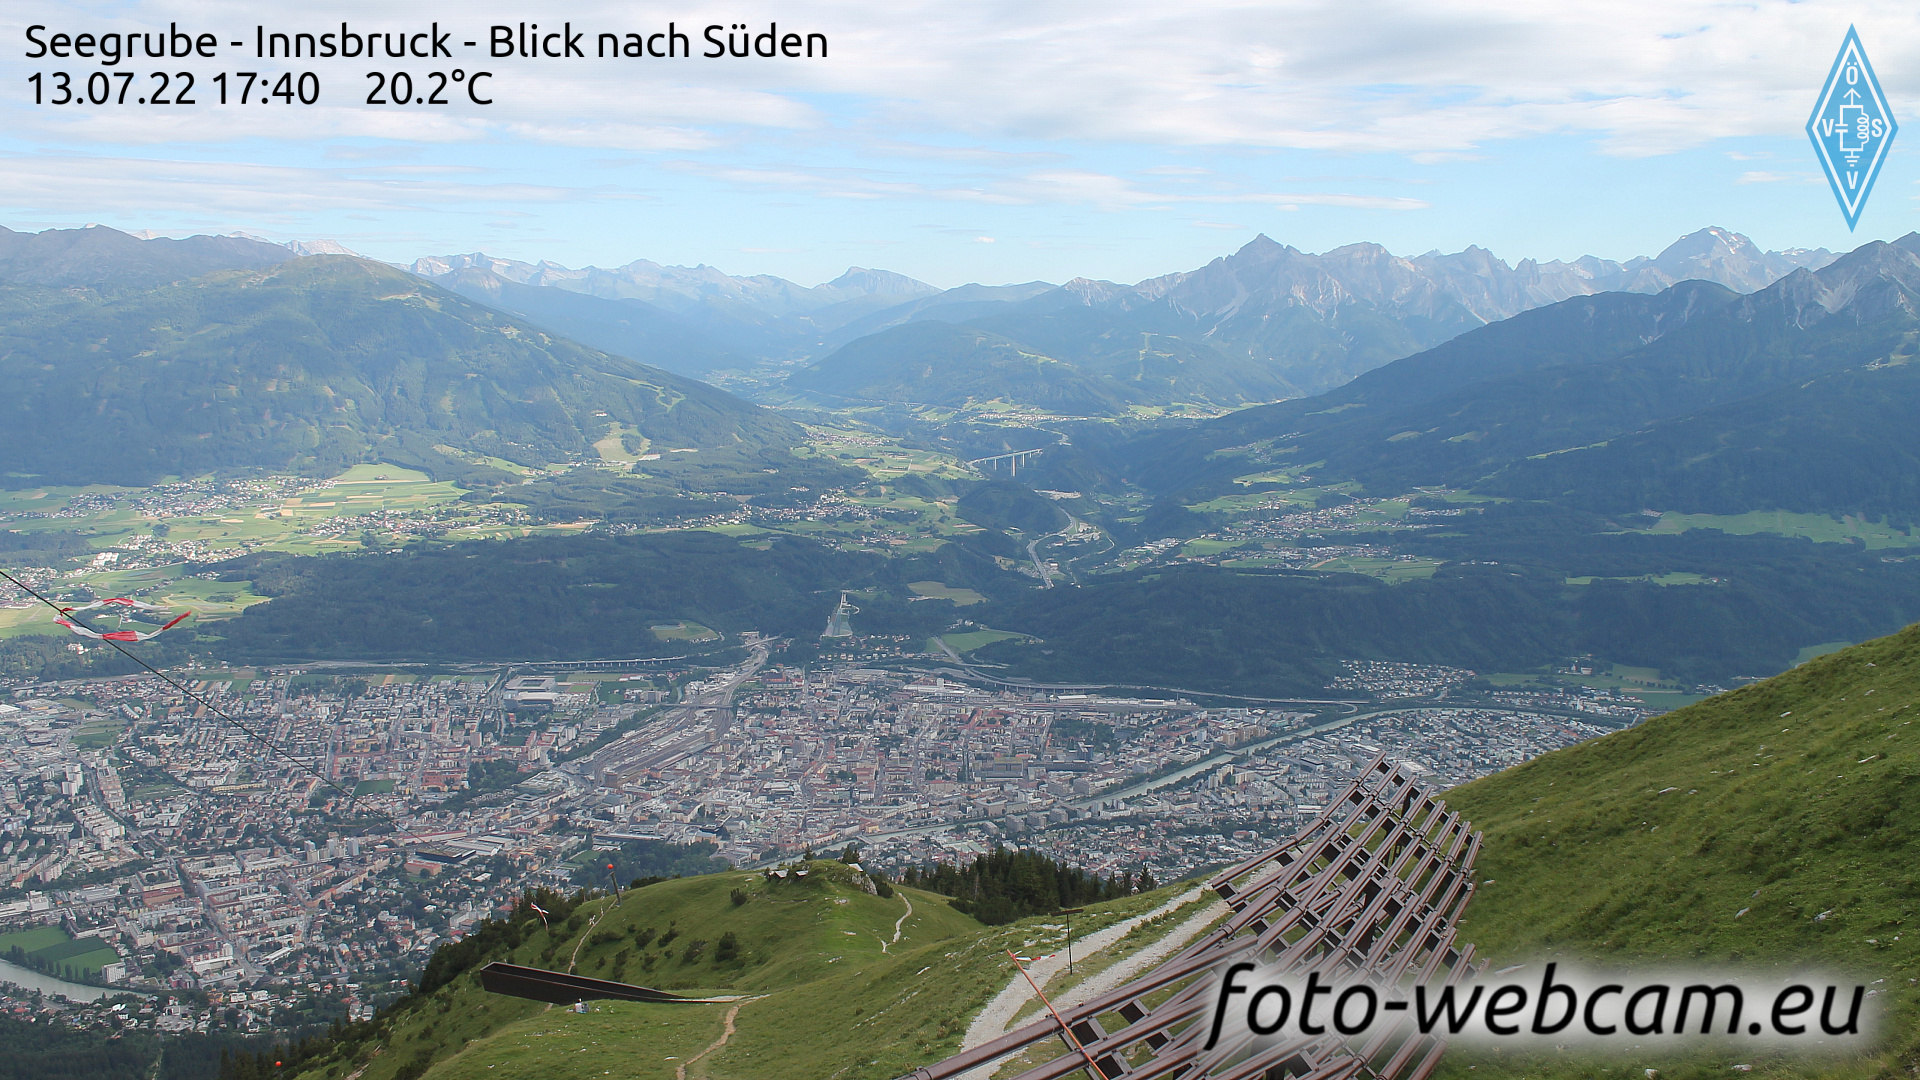 Innsbruck Wed. 17:18